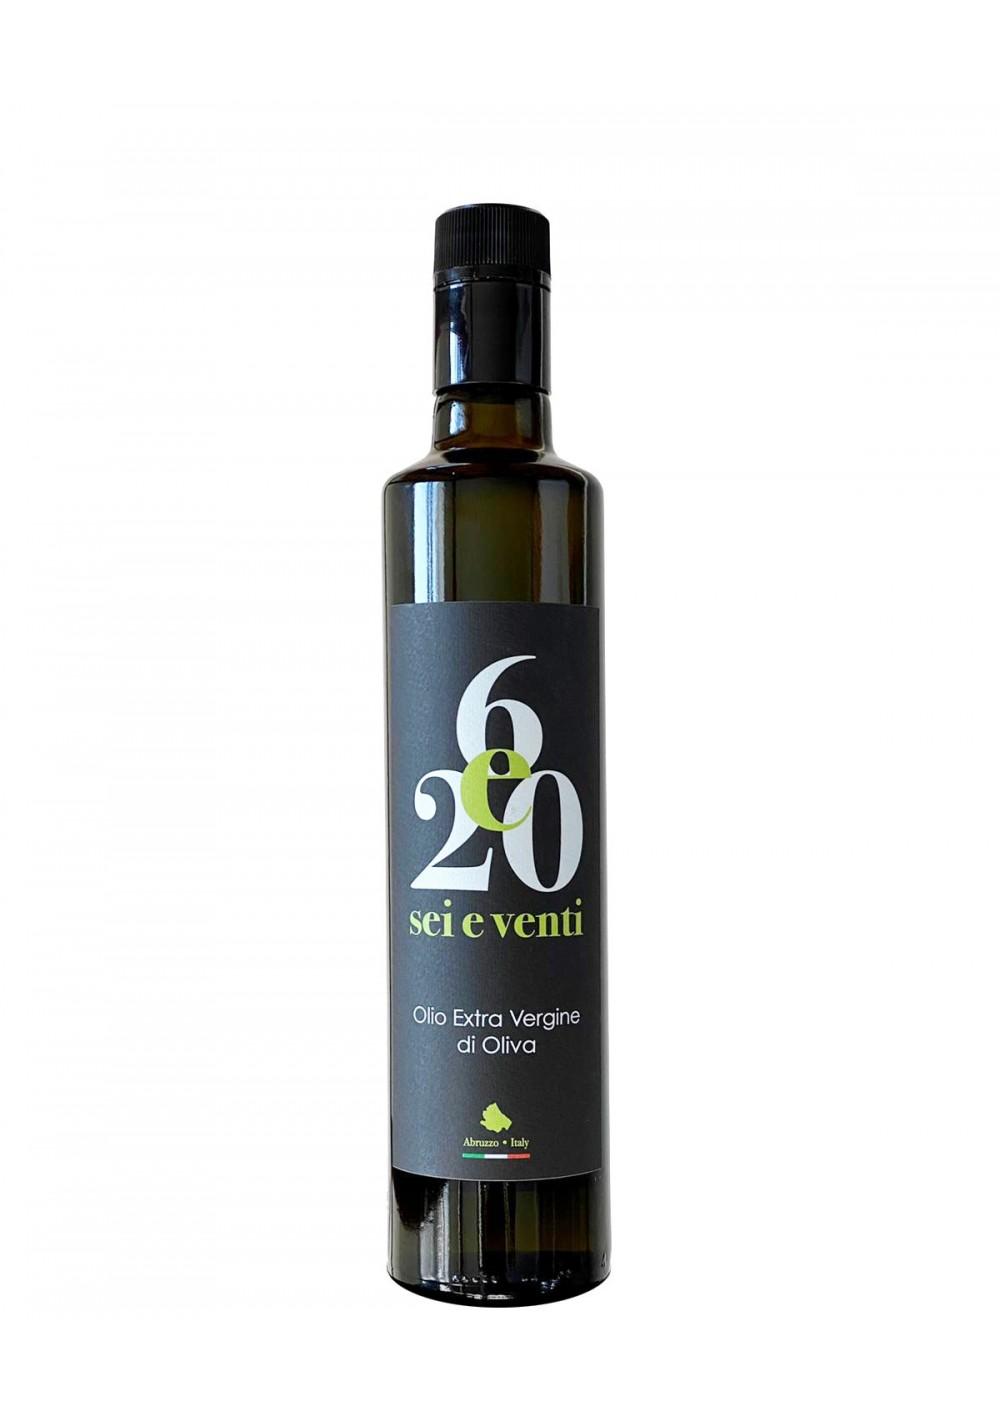 6e20, Olio Extravergine di oliva o,5 lt